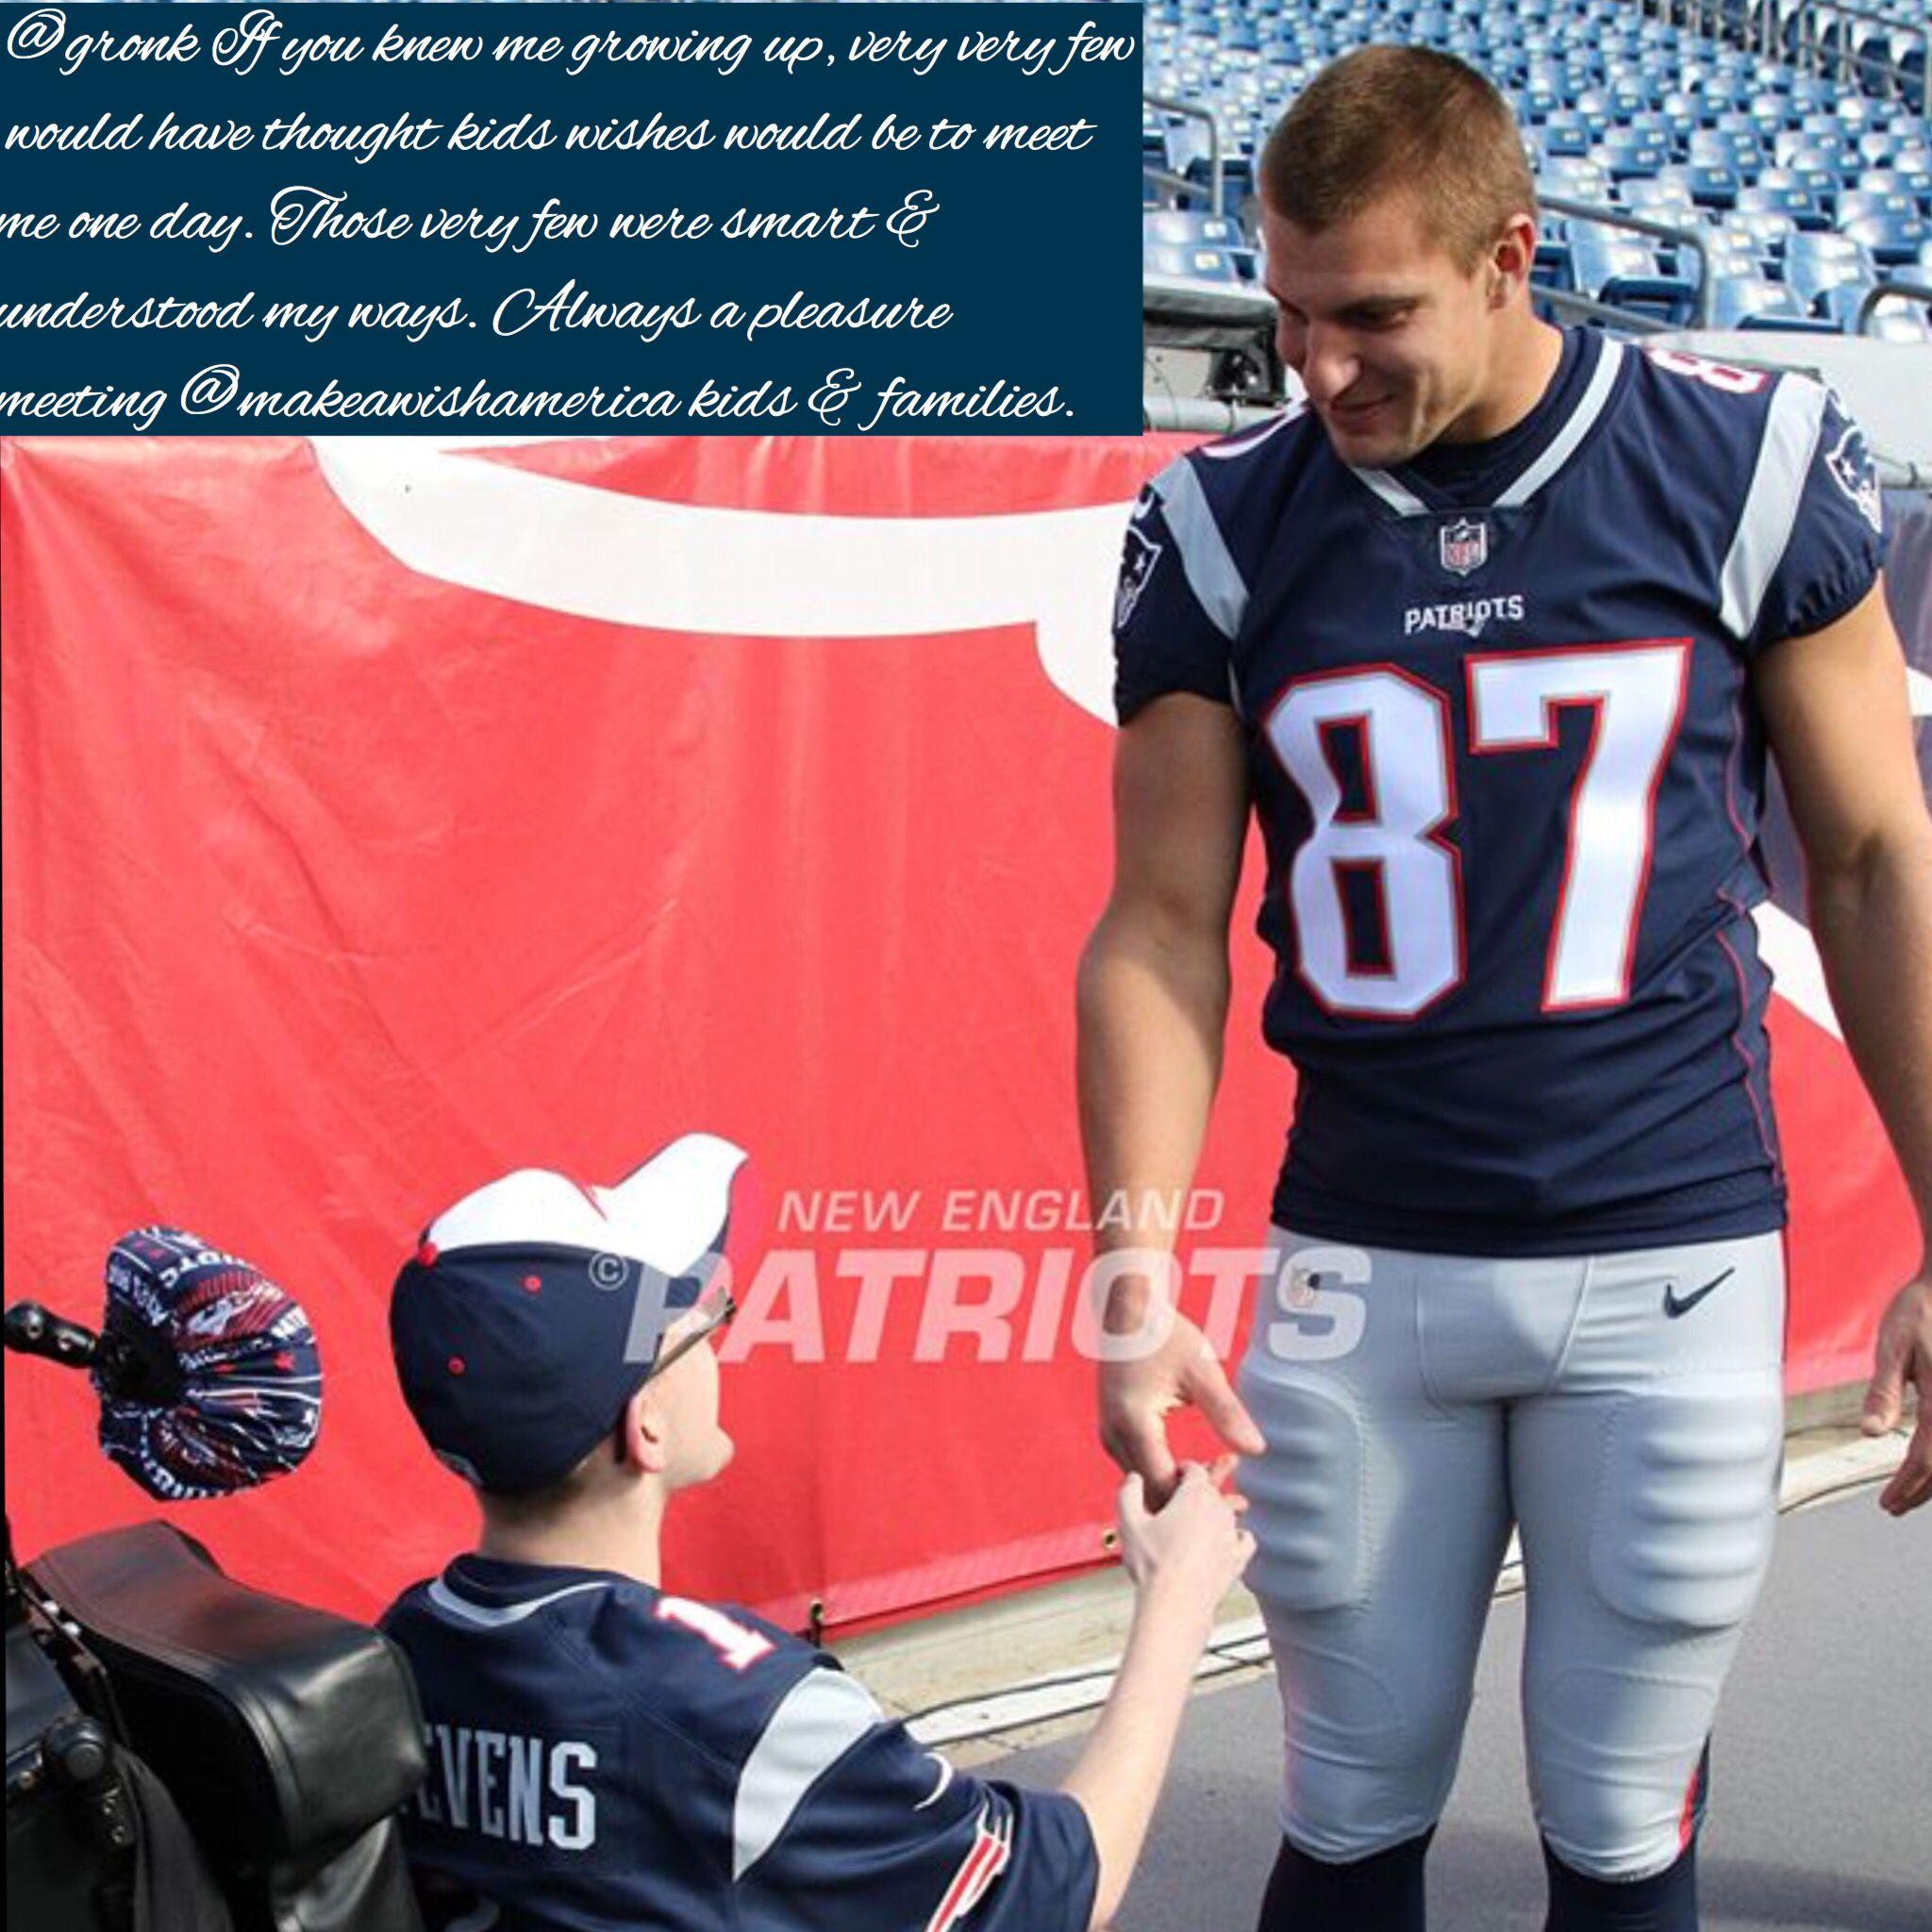 Pin By Deb Schneider On Rob Gronk Gronkowski New England Patriots Football New England Patriots Gronkowski